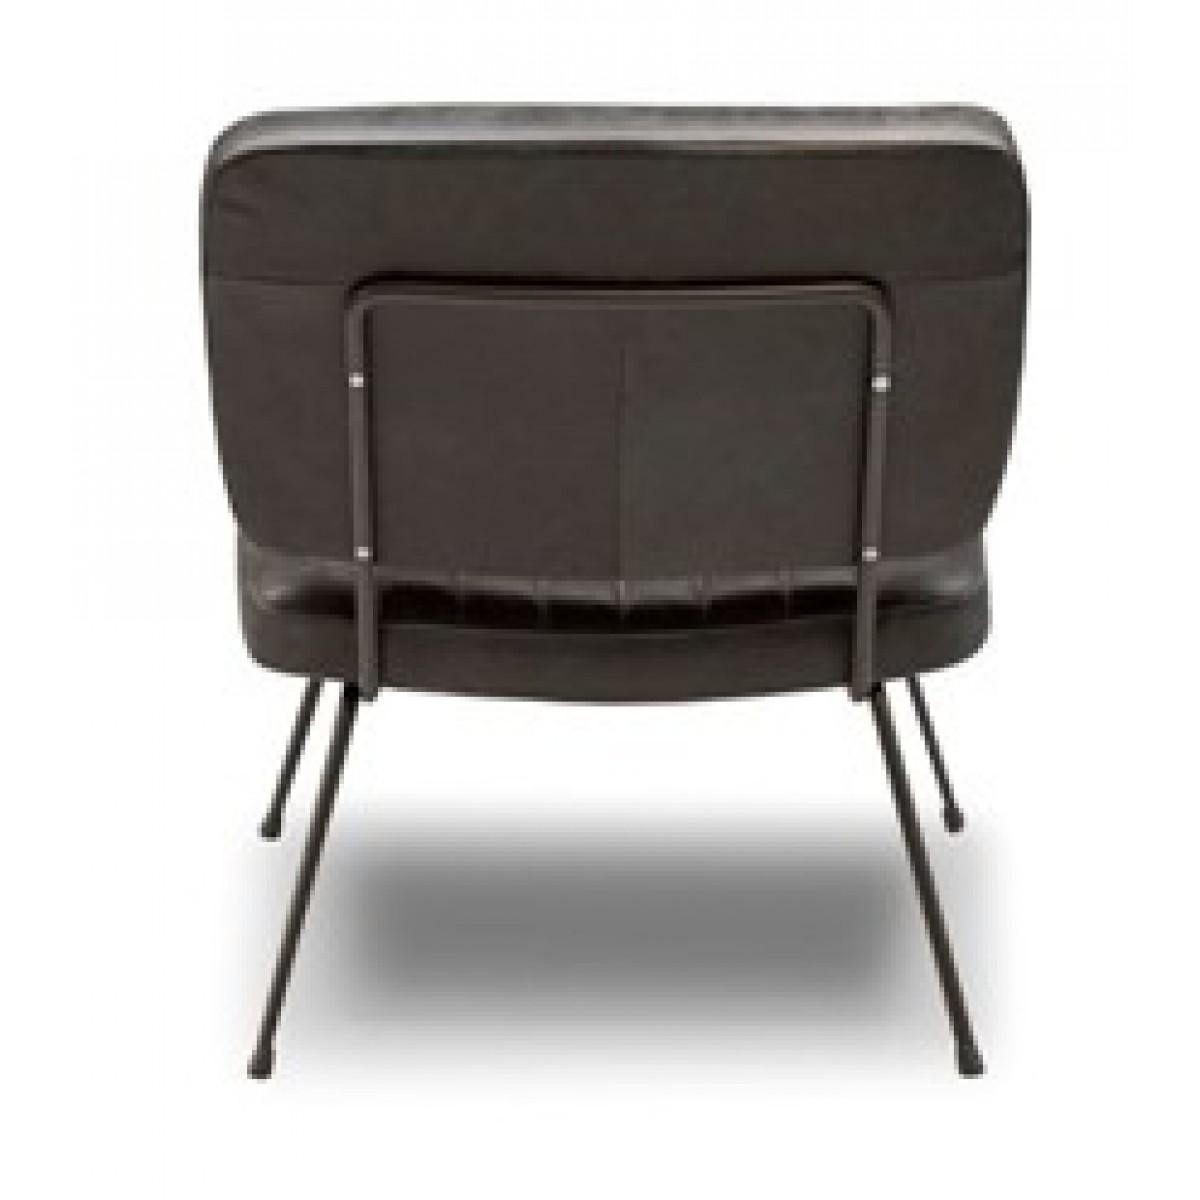 cocktail-fauteuil-leer-het-anker-miltonhouse-achter